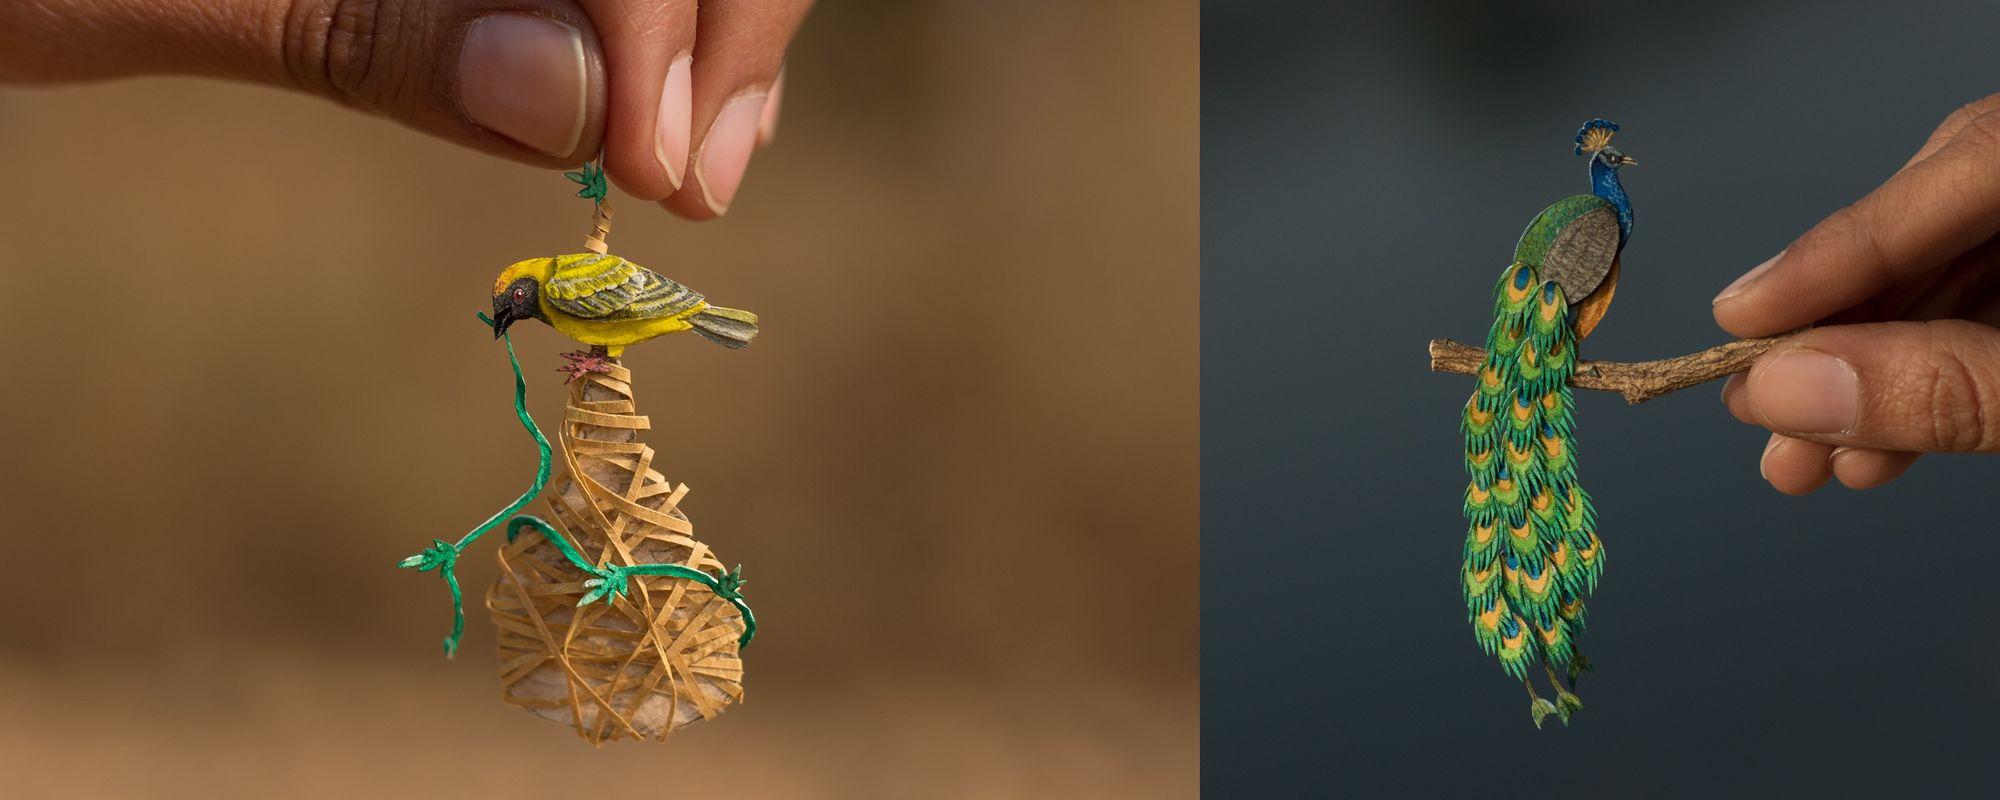 365 Days of Miniature, a beautiful Paper Cut project